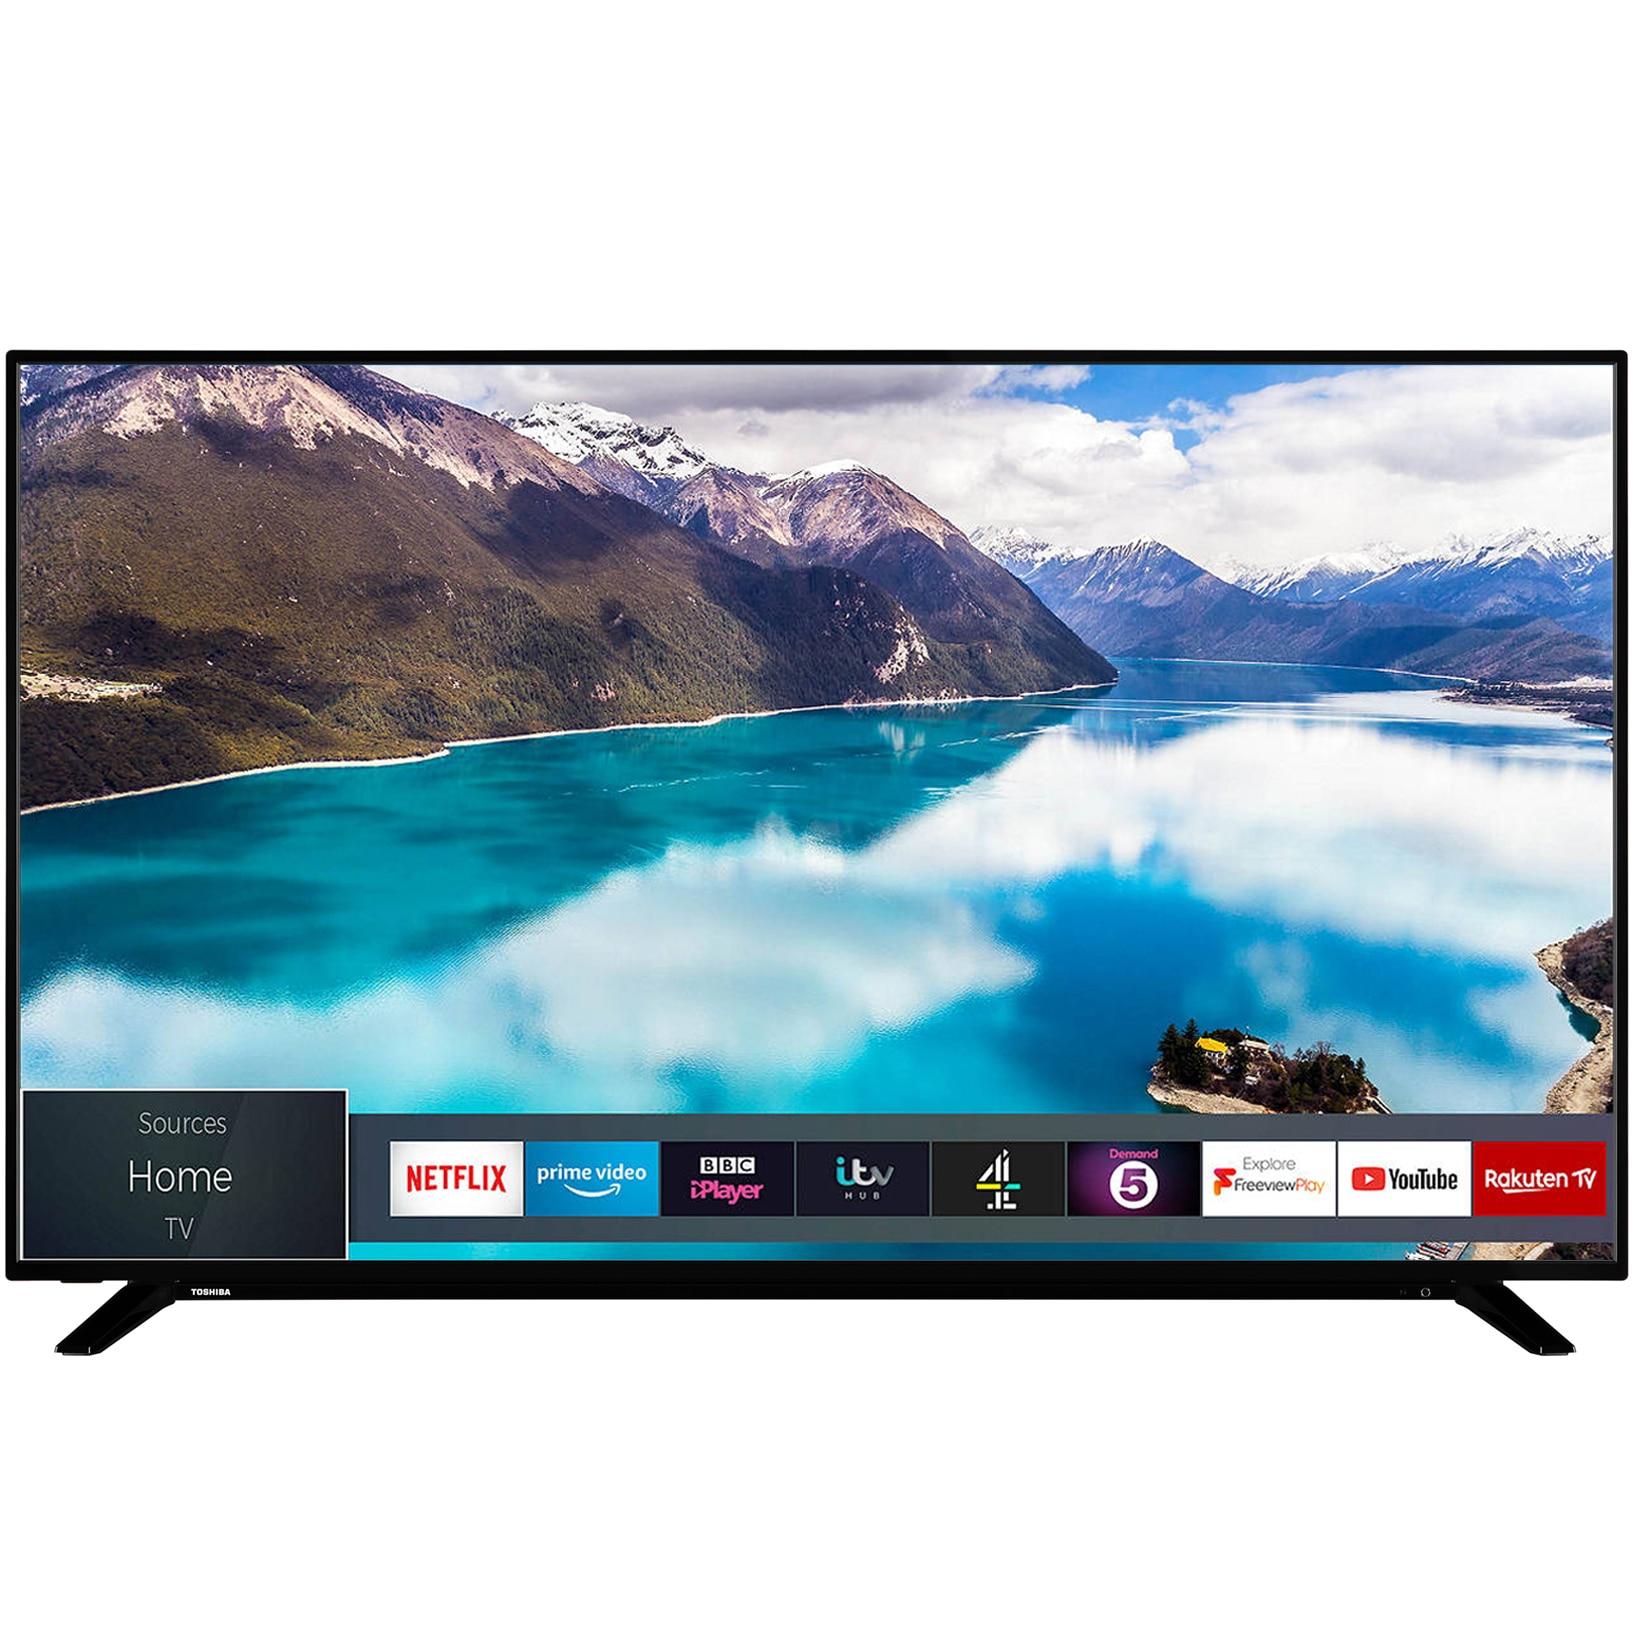 Fotografie Televizor Toshiba 65U2963DG, 164 cm, Smart, 4K Ultra HD, LED, Clasa A+